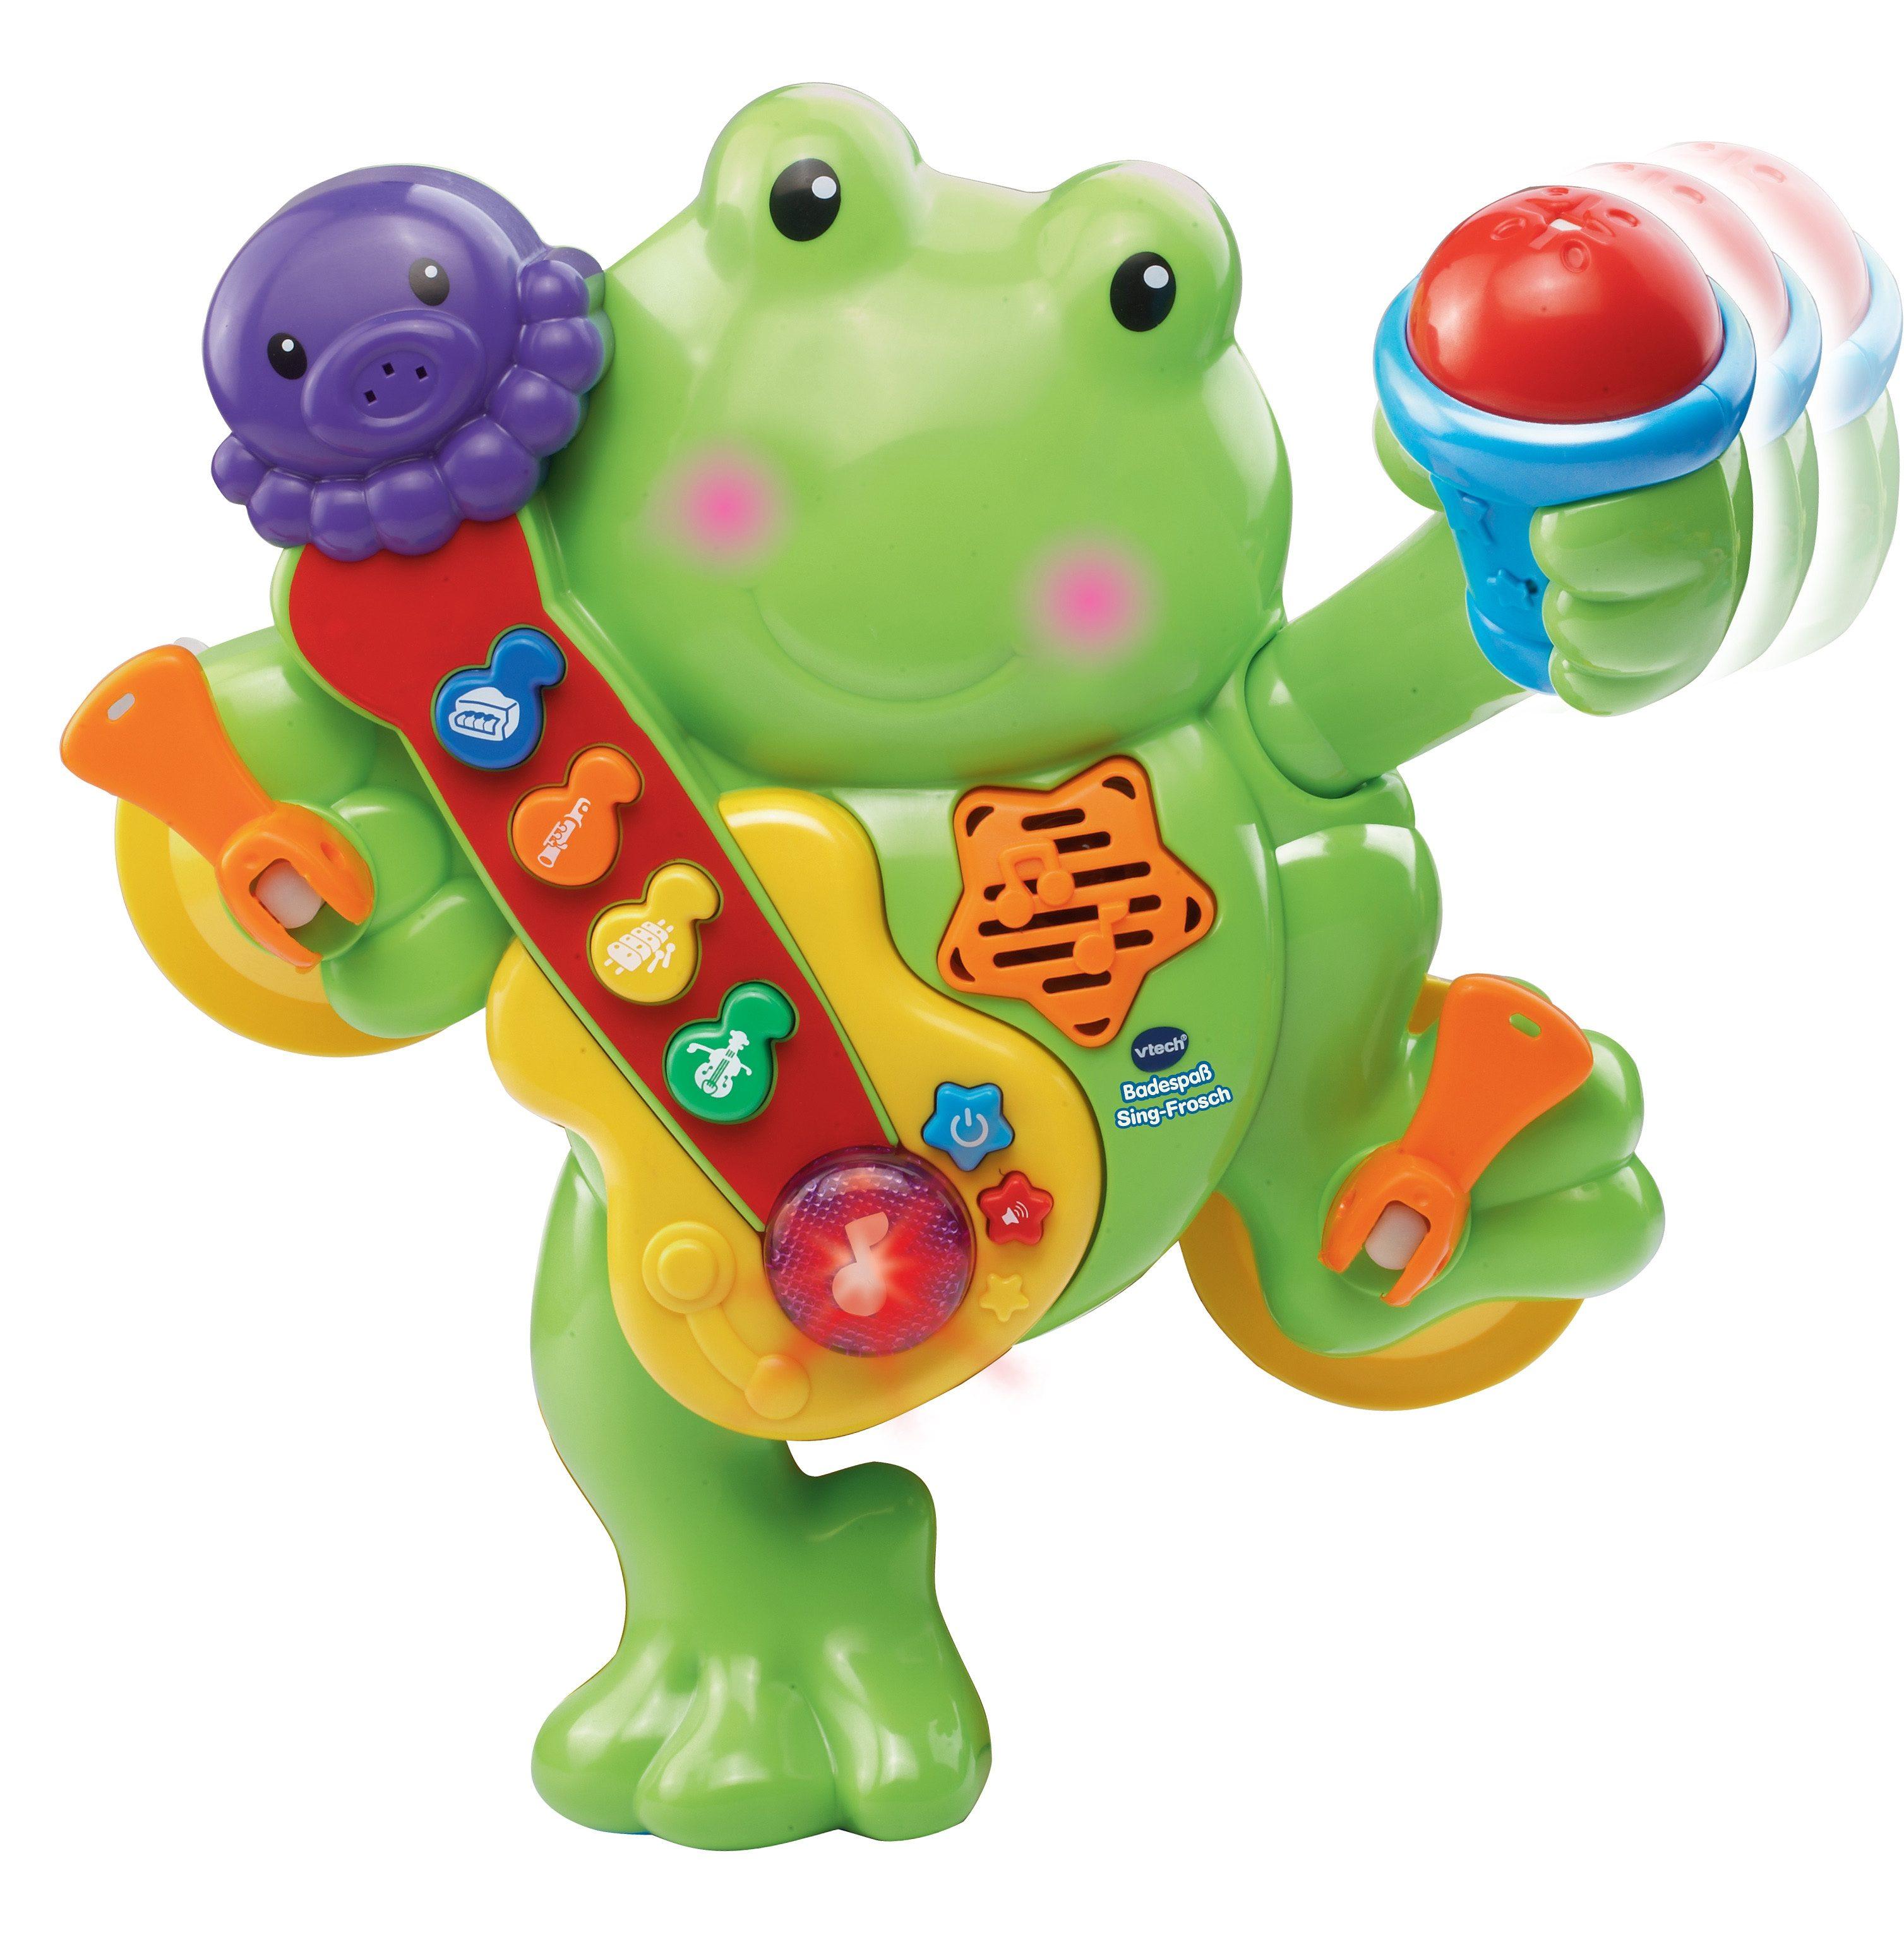 VTech Badespielzeug, »VTech Baby - Badespaß Sing-Frosch«